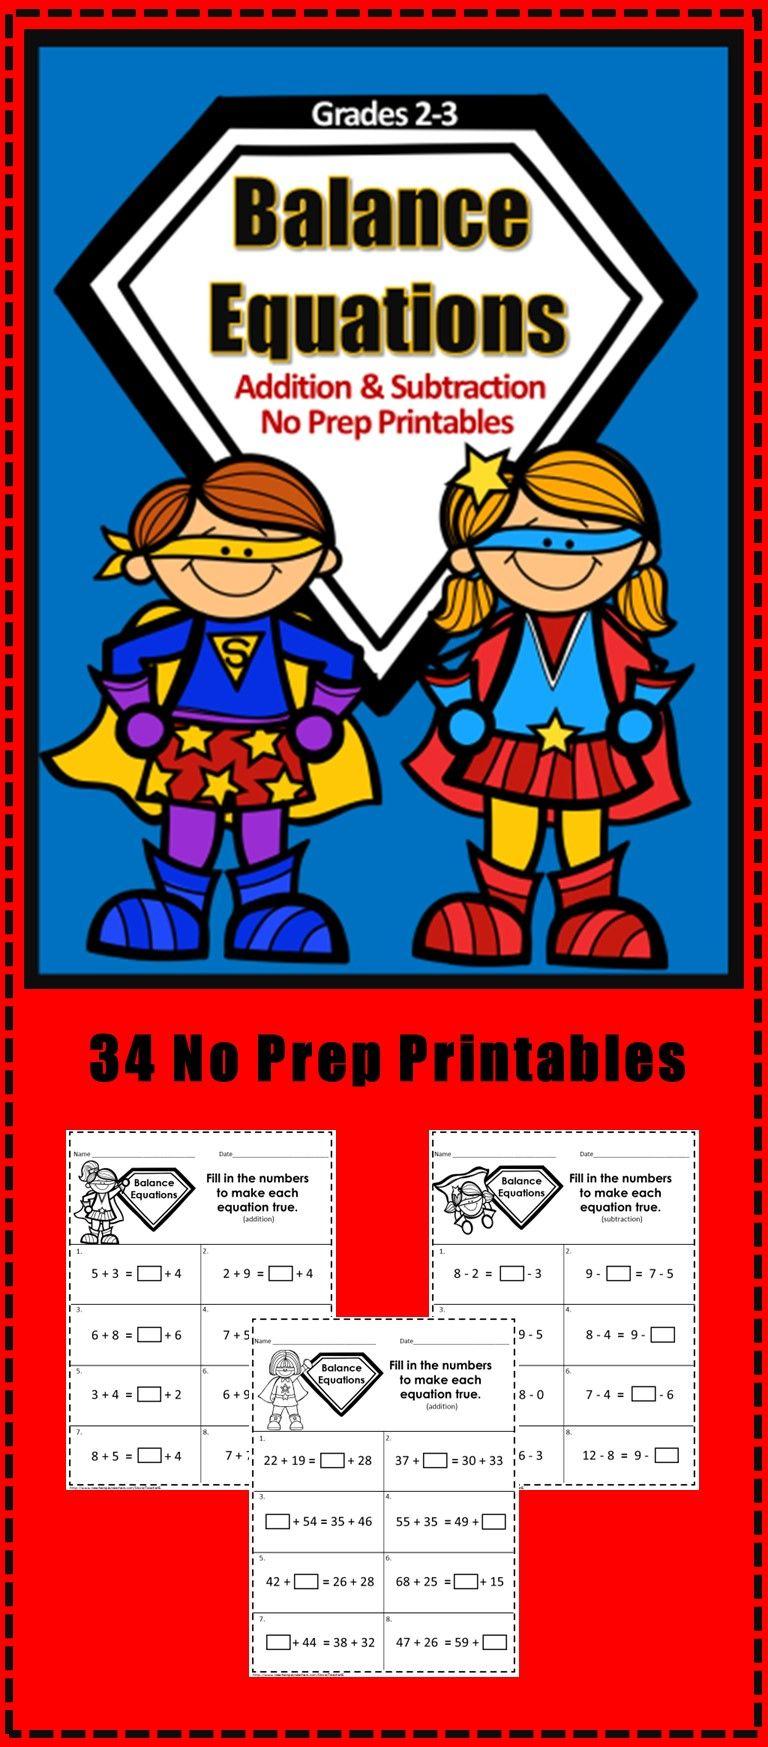 Addition And Subtraction Balance Equations 34 No Prep Printables Grades 2 3 Superhero Theme Addition And Subtraction Superhero Theme Equations Addition and subtraction balancing